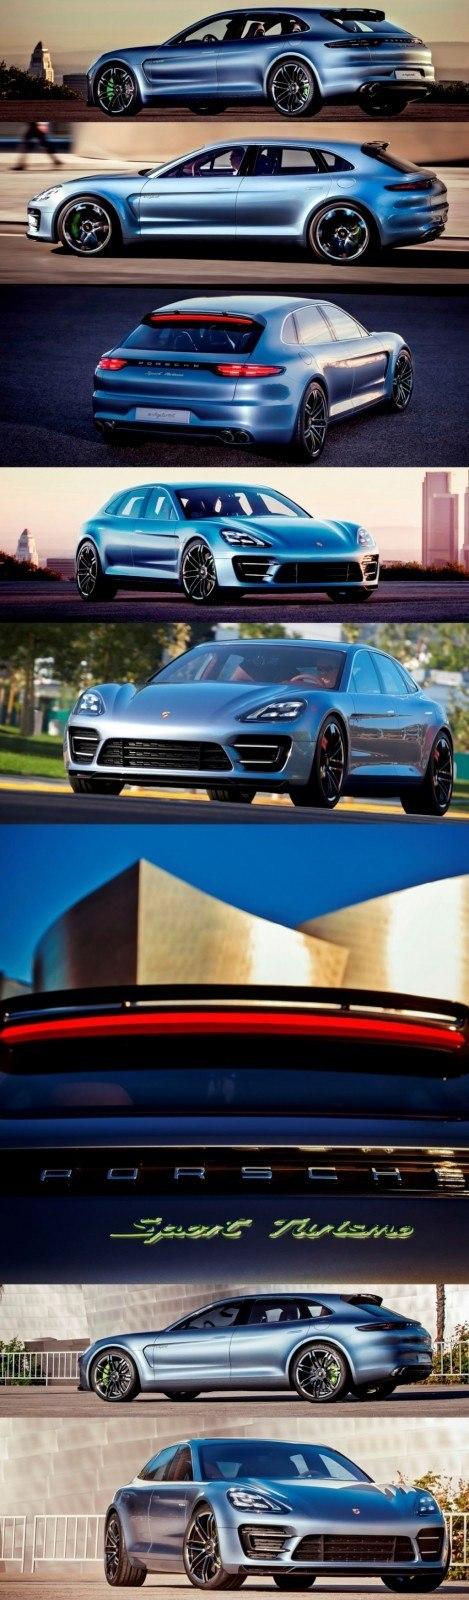 Concept-Debrief-Porsche-Panamera-Sport-Turismo-8-vert-1054x3600